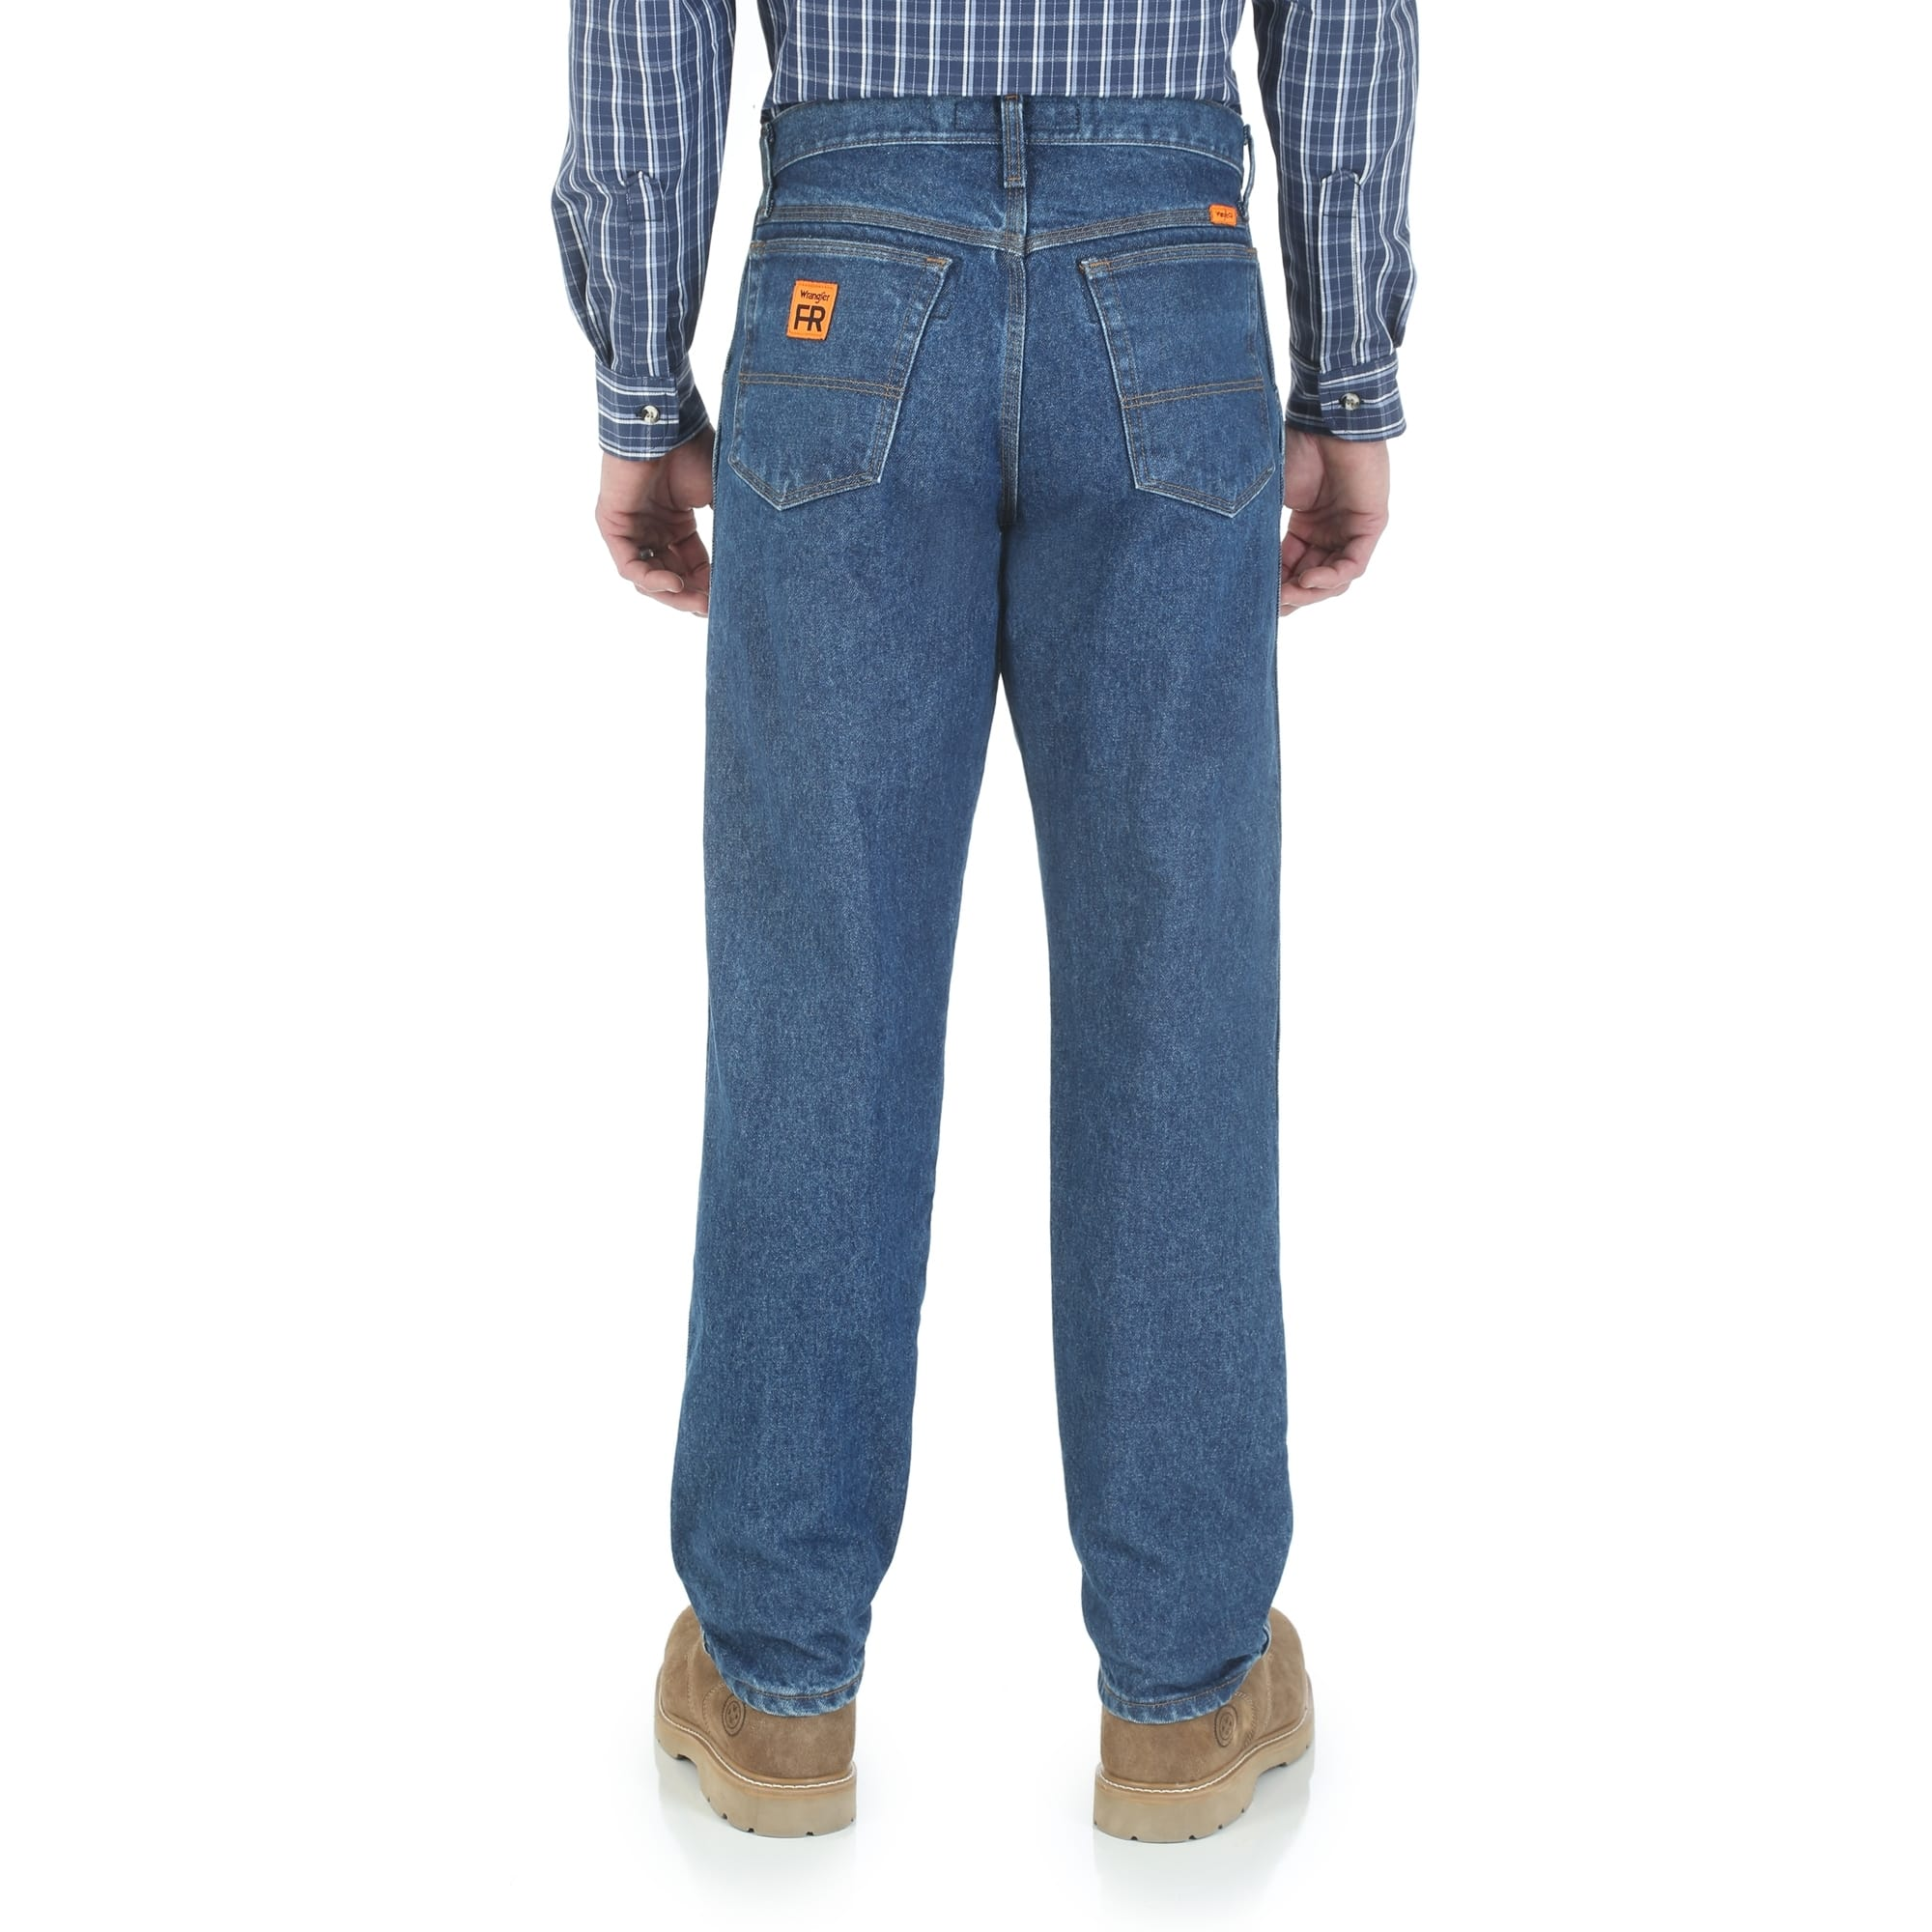 Mens Jeans 40 X 32